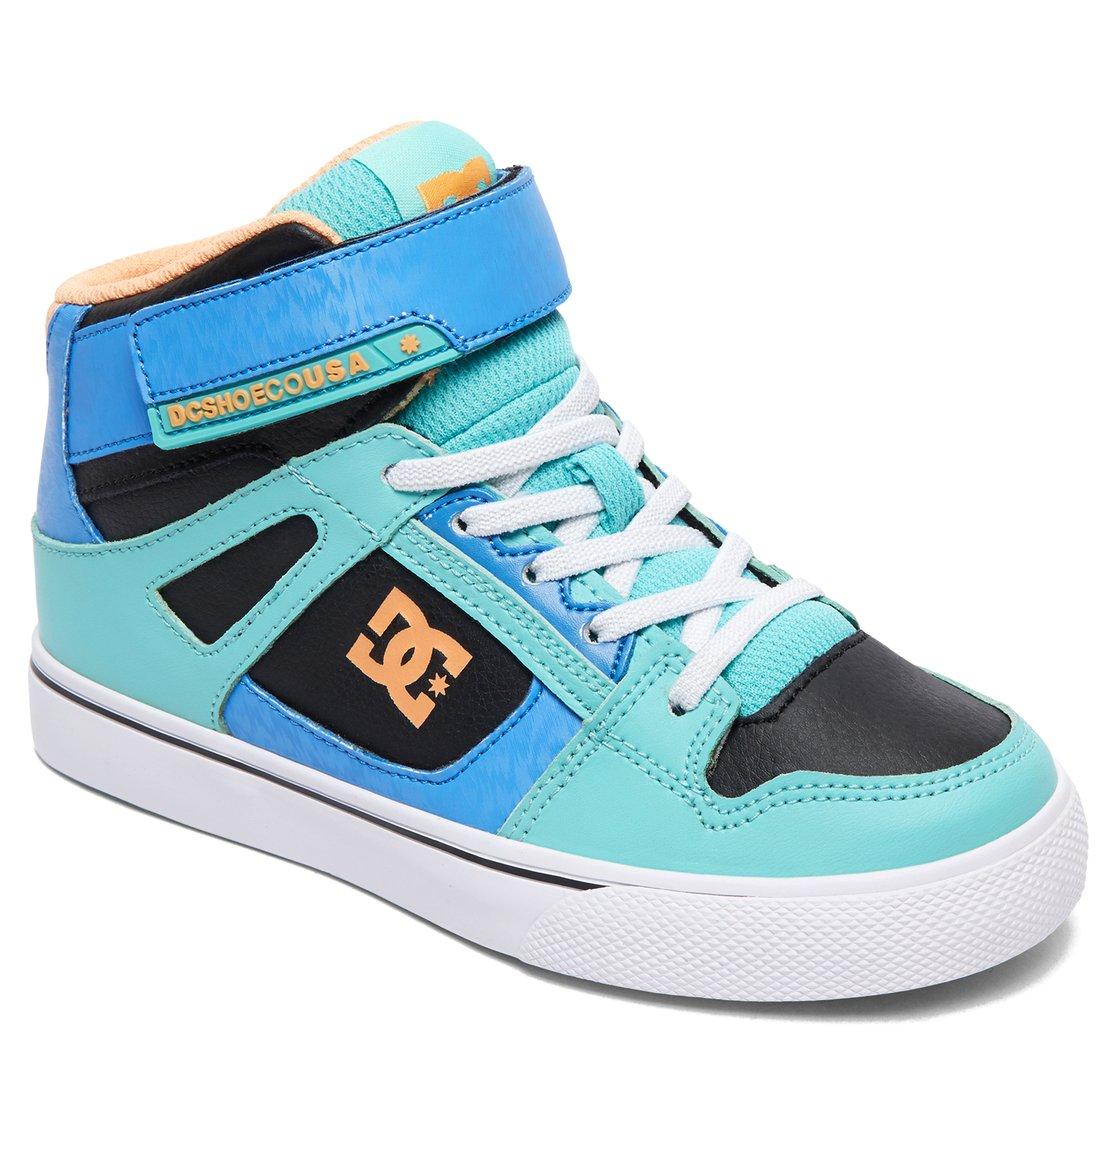 6a3def20c32f DC Shoes™ Girl s 8-16 Pure High EV High-Top Shoes ADGS300092